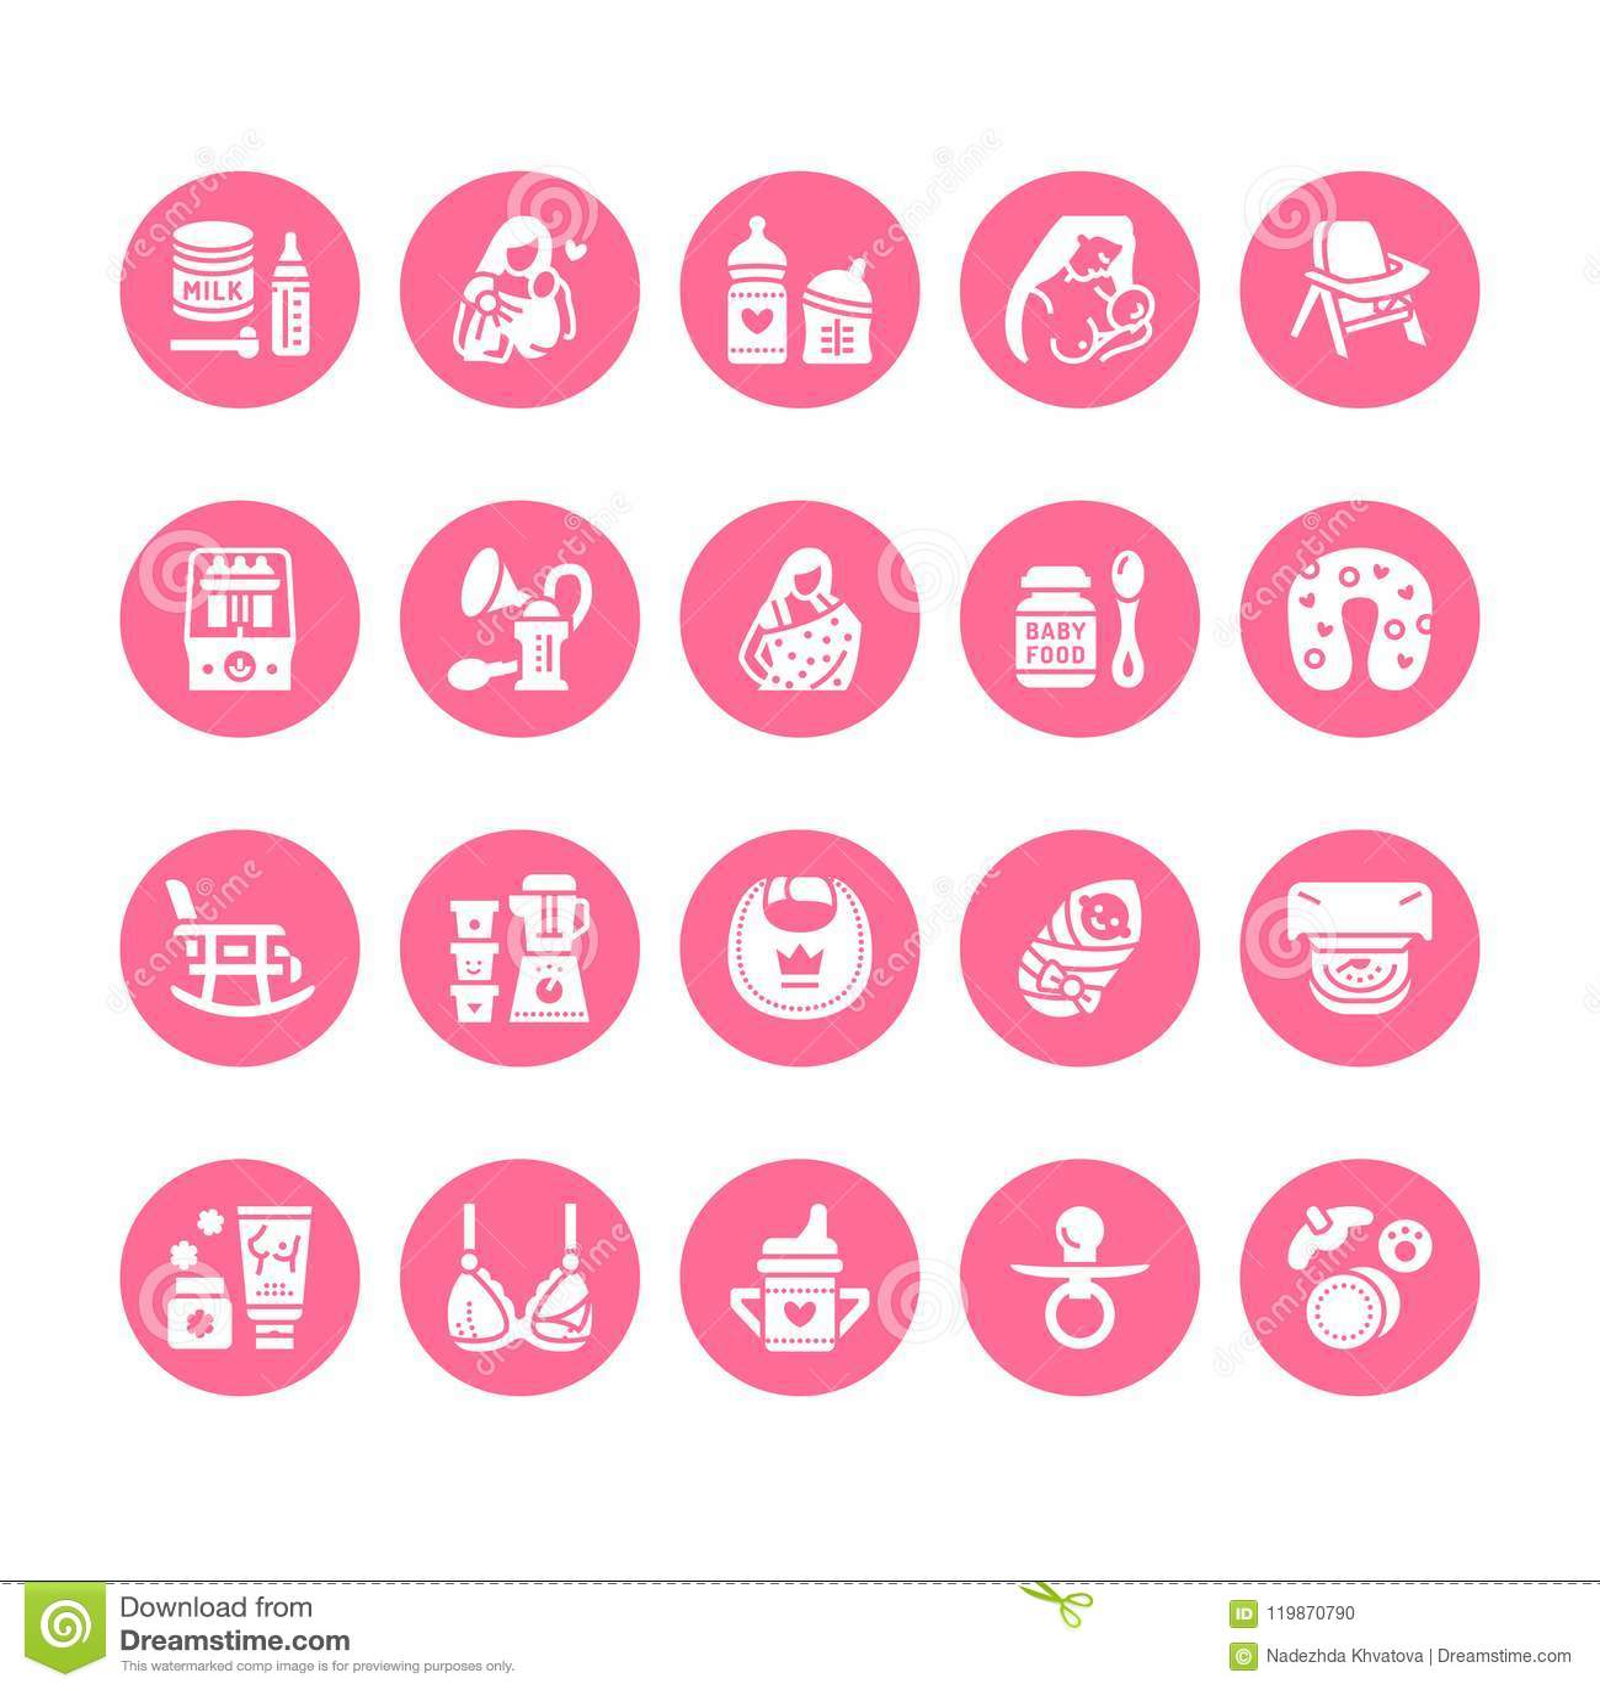 Breastfeeding, baby food vector flat glyph icons. Breast feeding elements - pump, woman, child, powdered milk, bottle